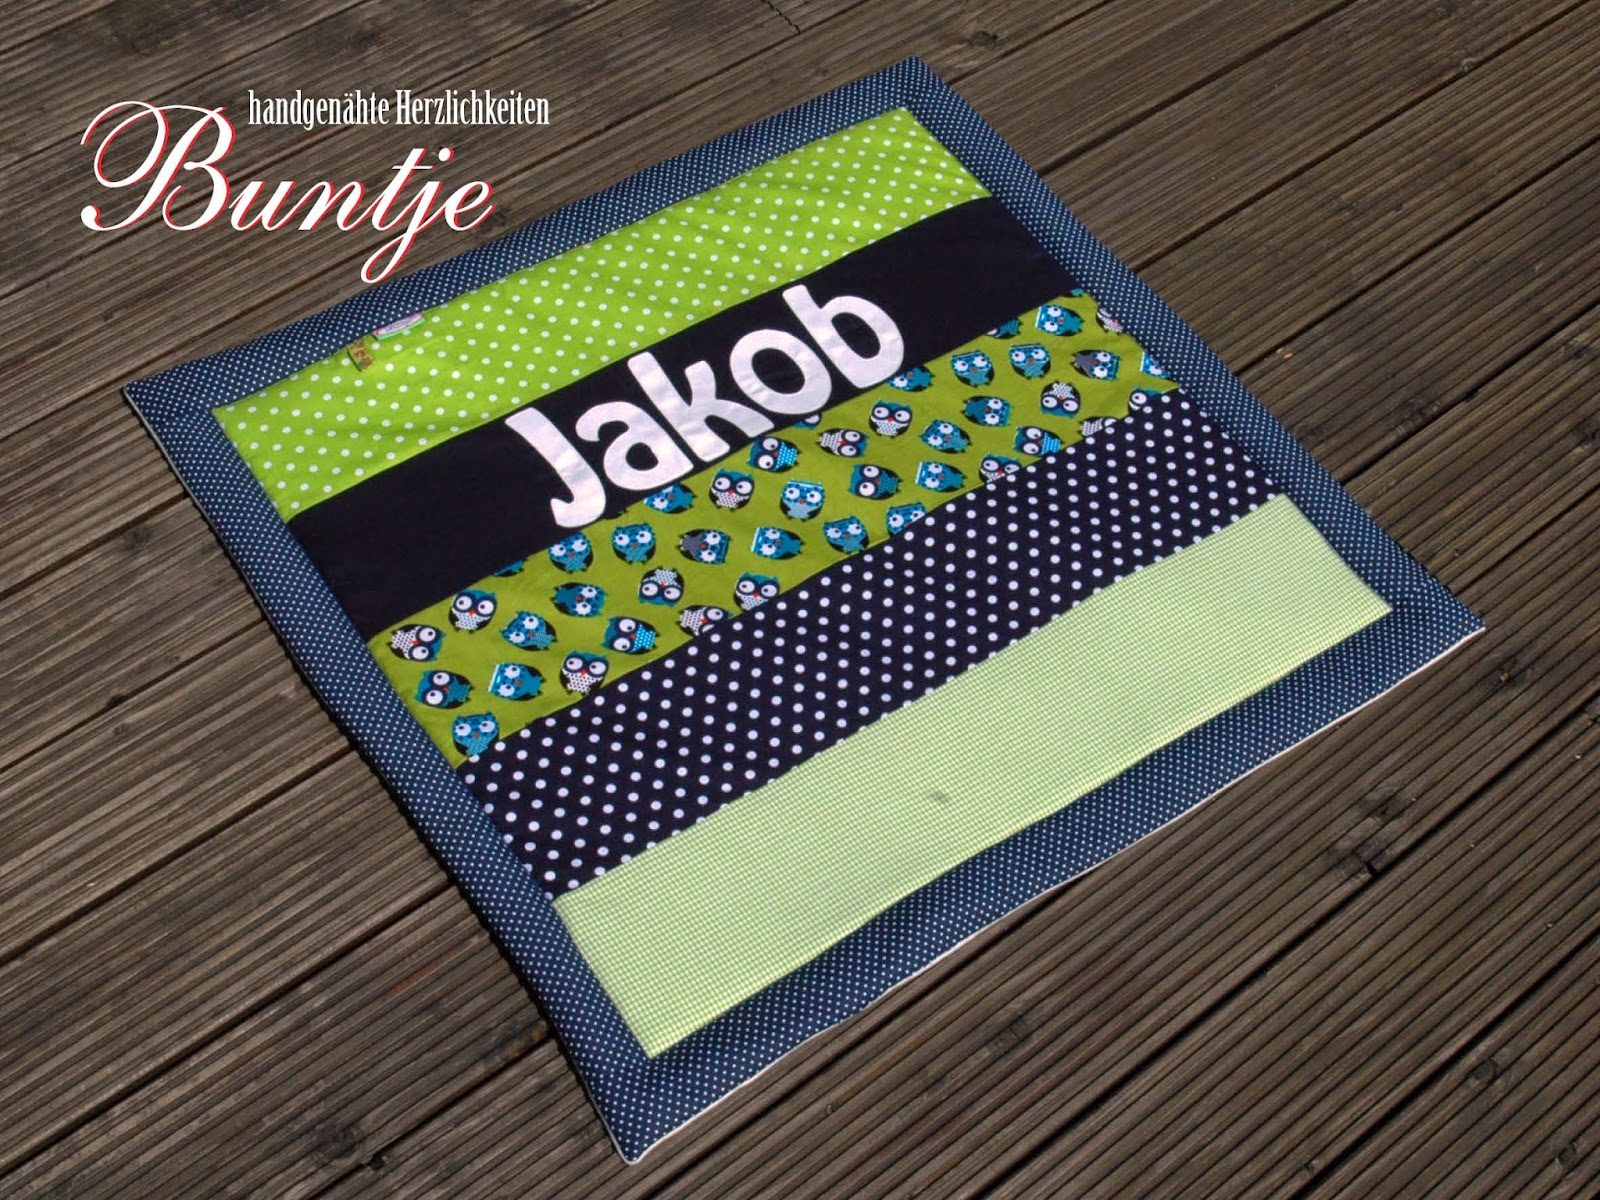 Krabbeldecke Kuscheldecke Decke Baby Name Geschenk Geburt Taufe Junge Jakob Jacob Eulen blau grün Fleece Baumwolle Buntje nähen